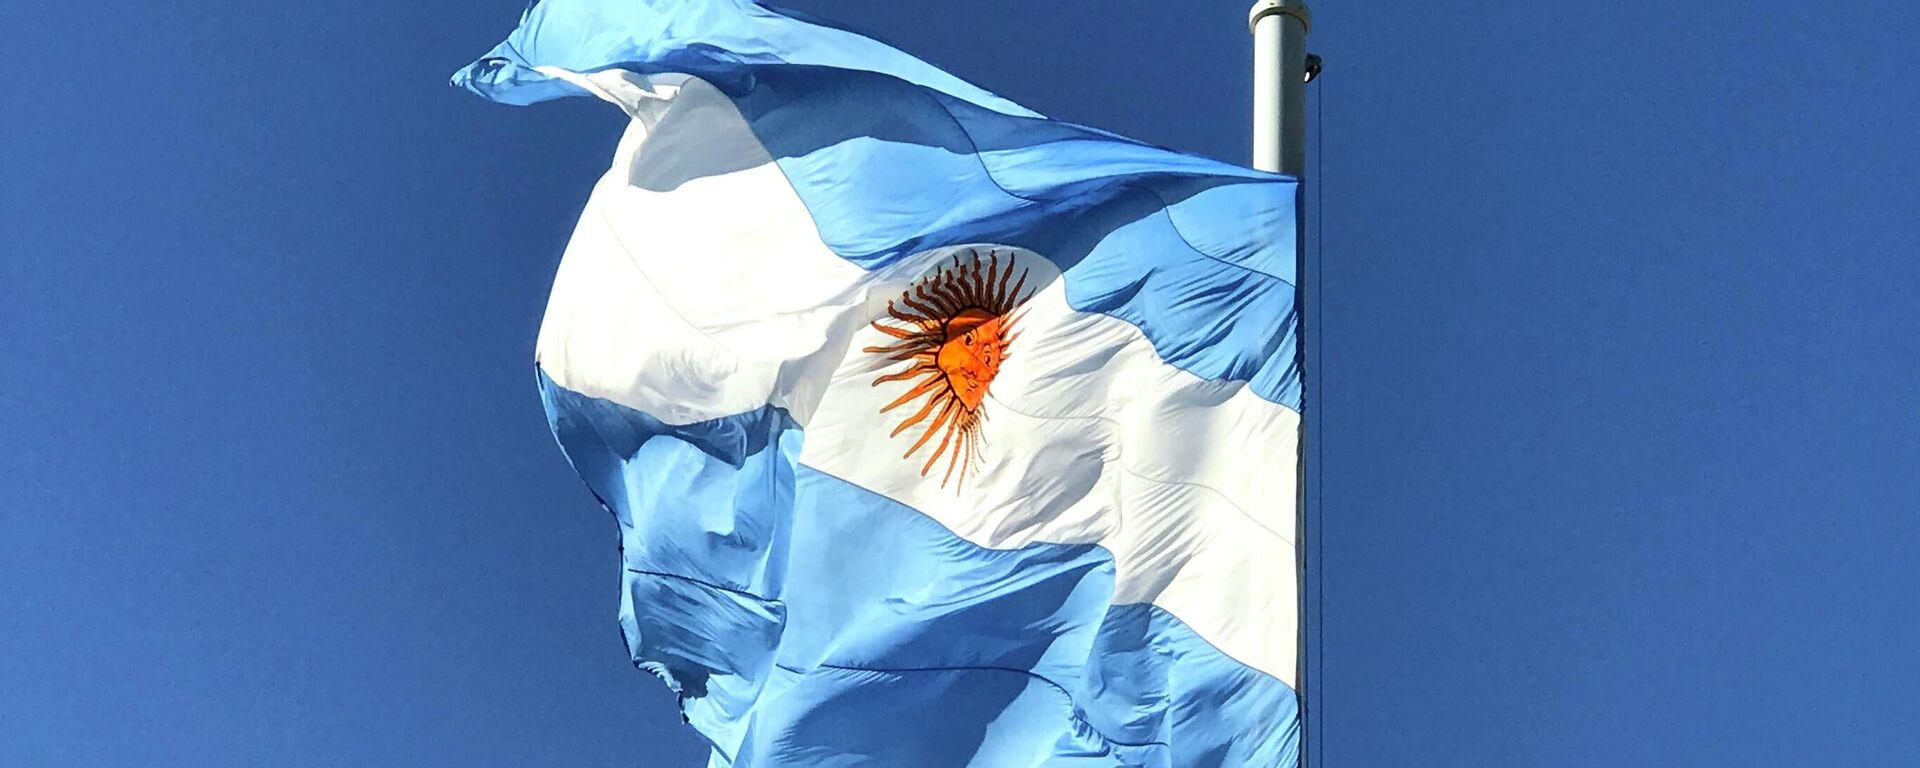 Bandera de Argentina - Sputnik Mundo, 1920, 08.06.2021